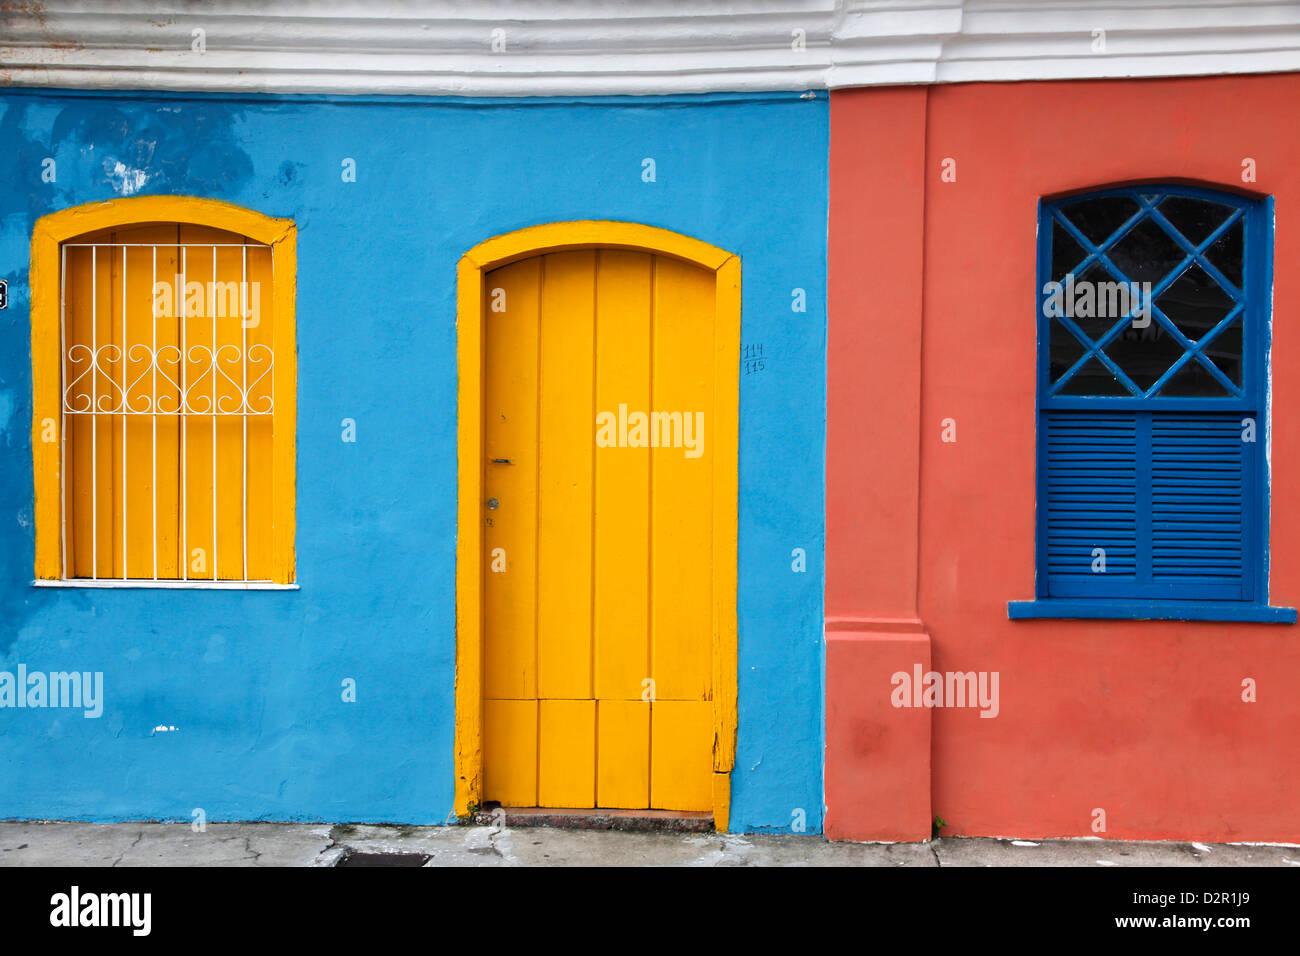 Koloniale Gebäude an der kolonialen Altstadt in den unteren Bereich, Porto Seguro, Bahia, Brasilien, Südamerika Stockbild